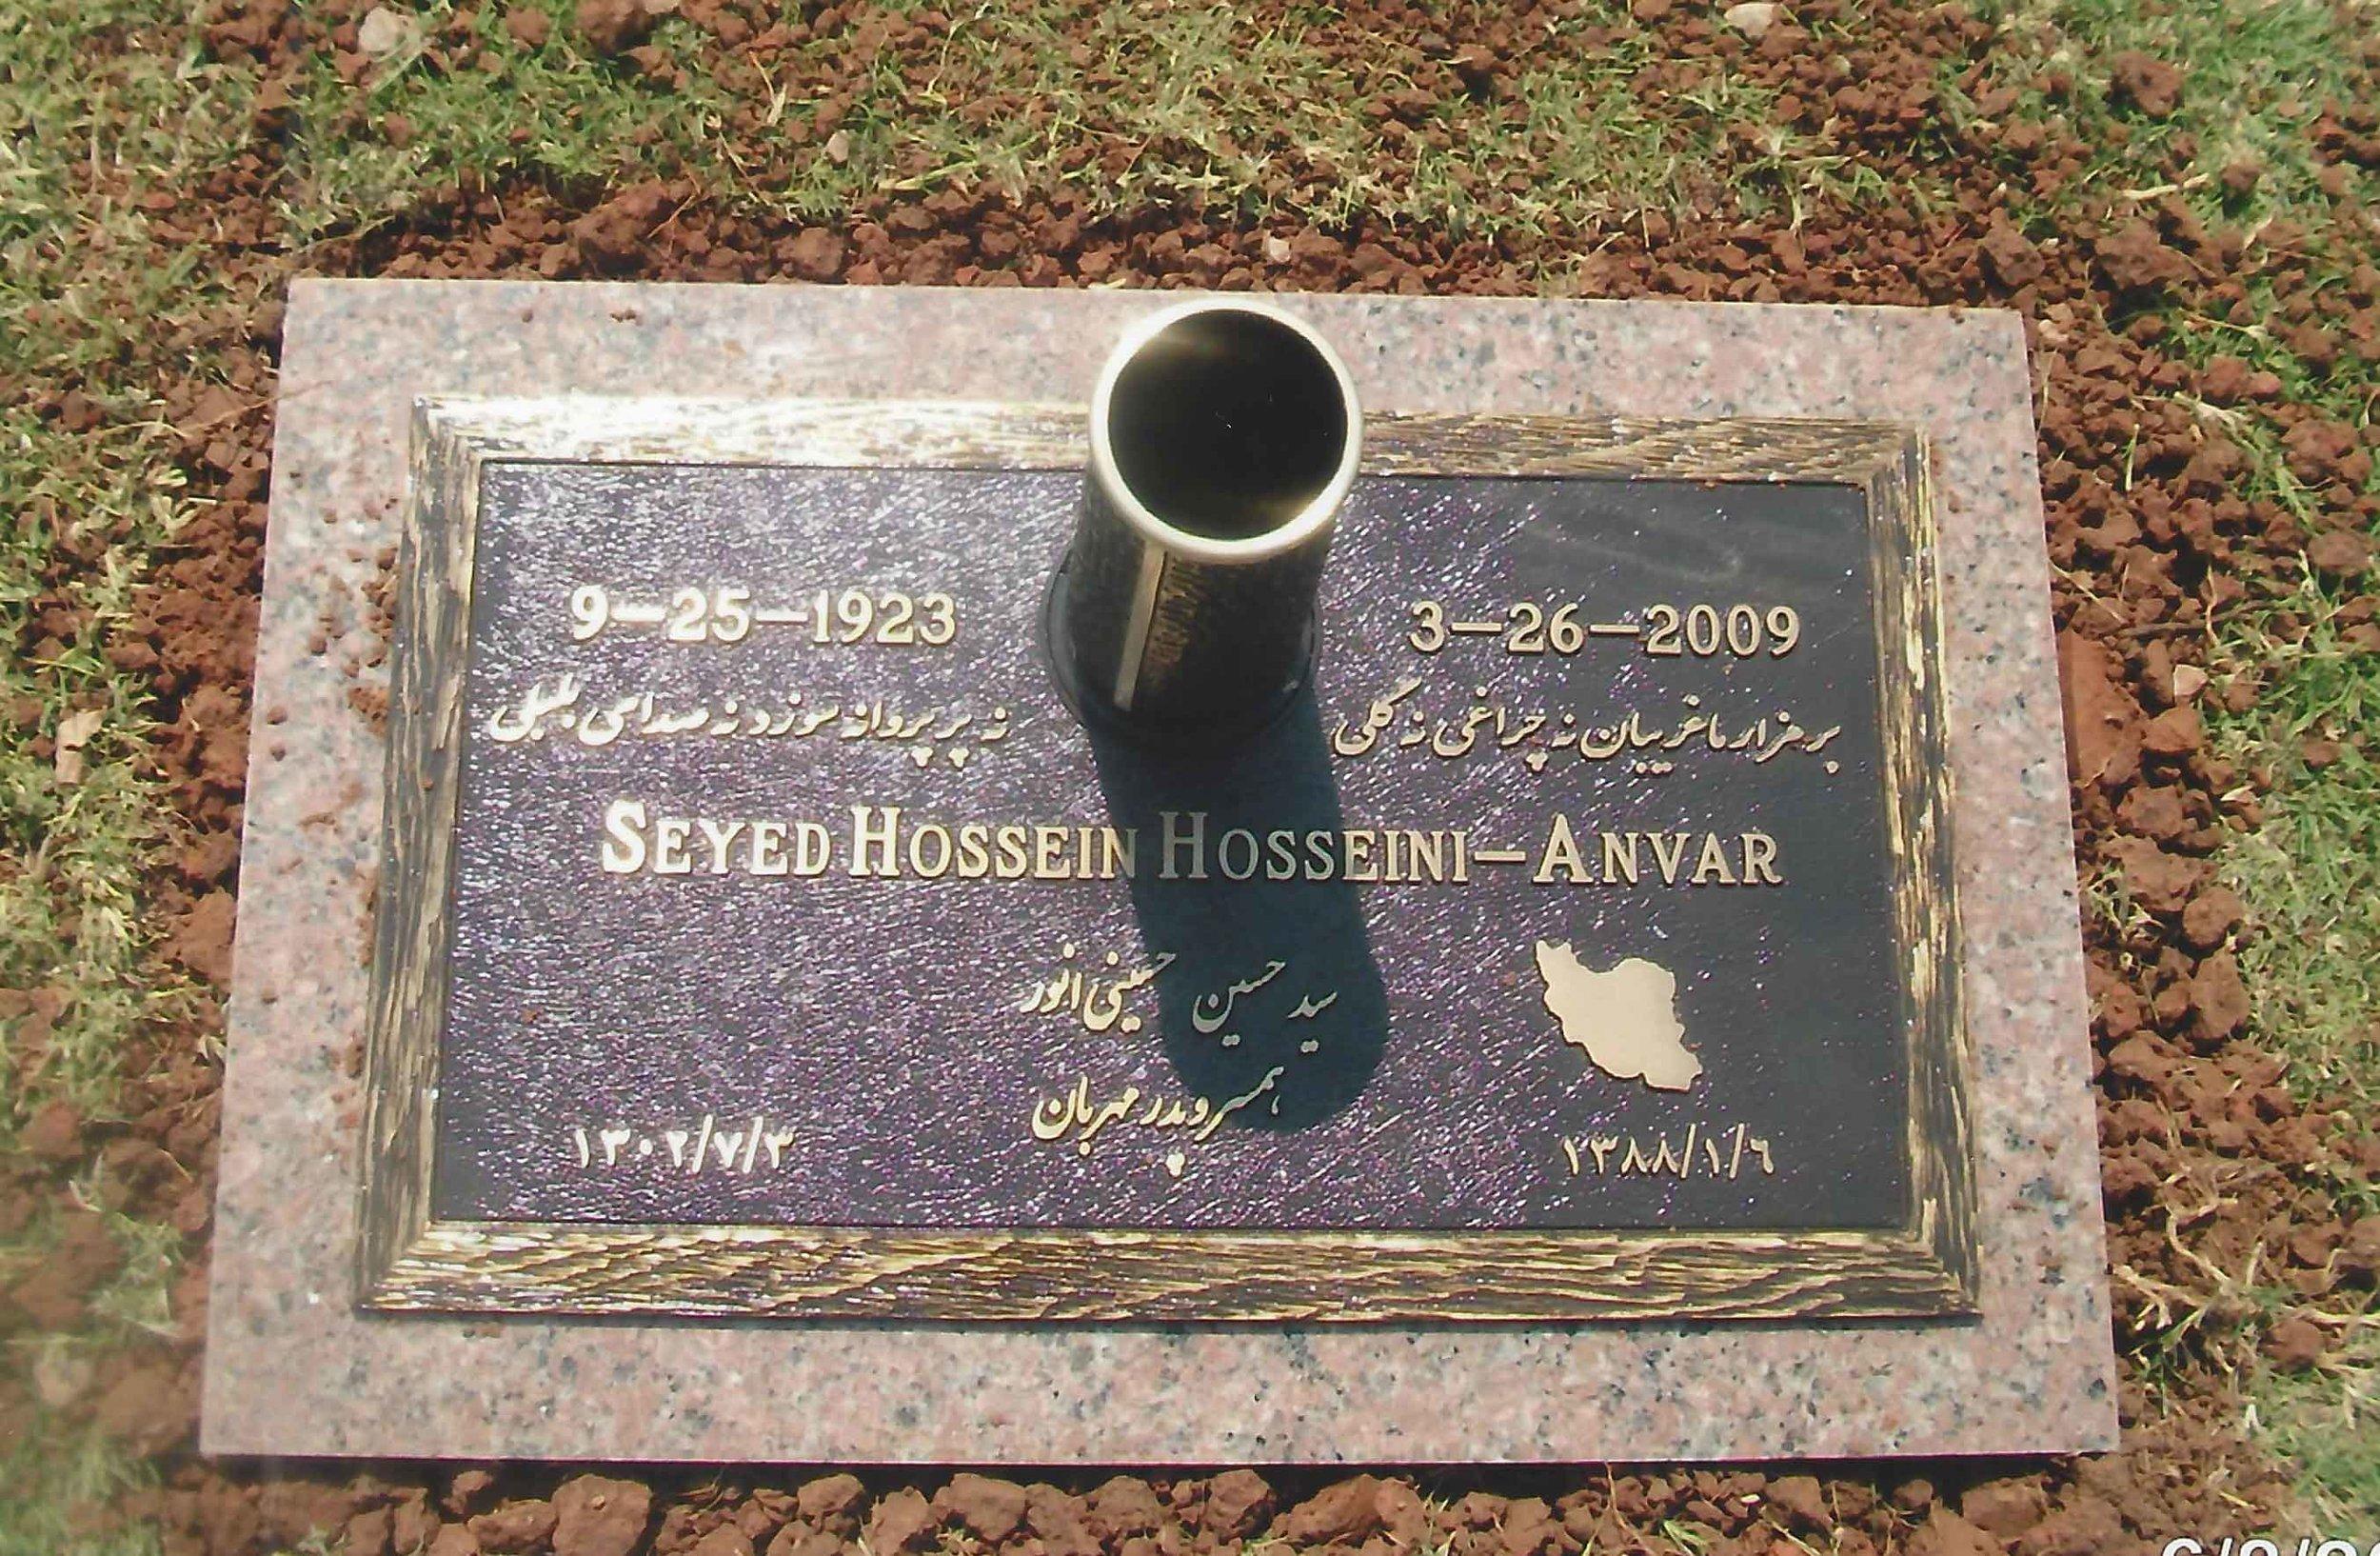 24. Memorial Park Cemetery